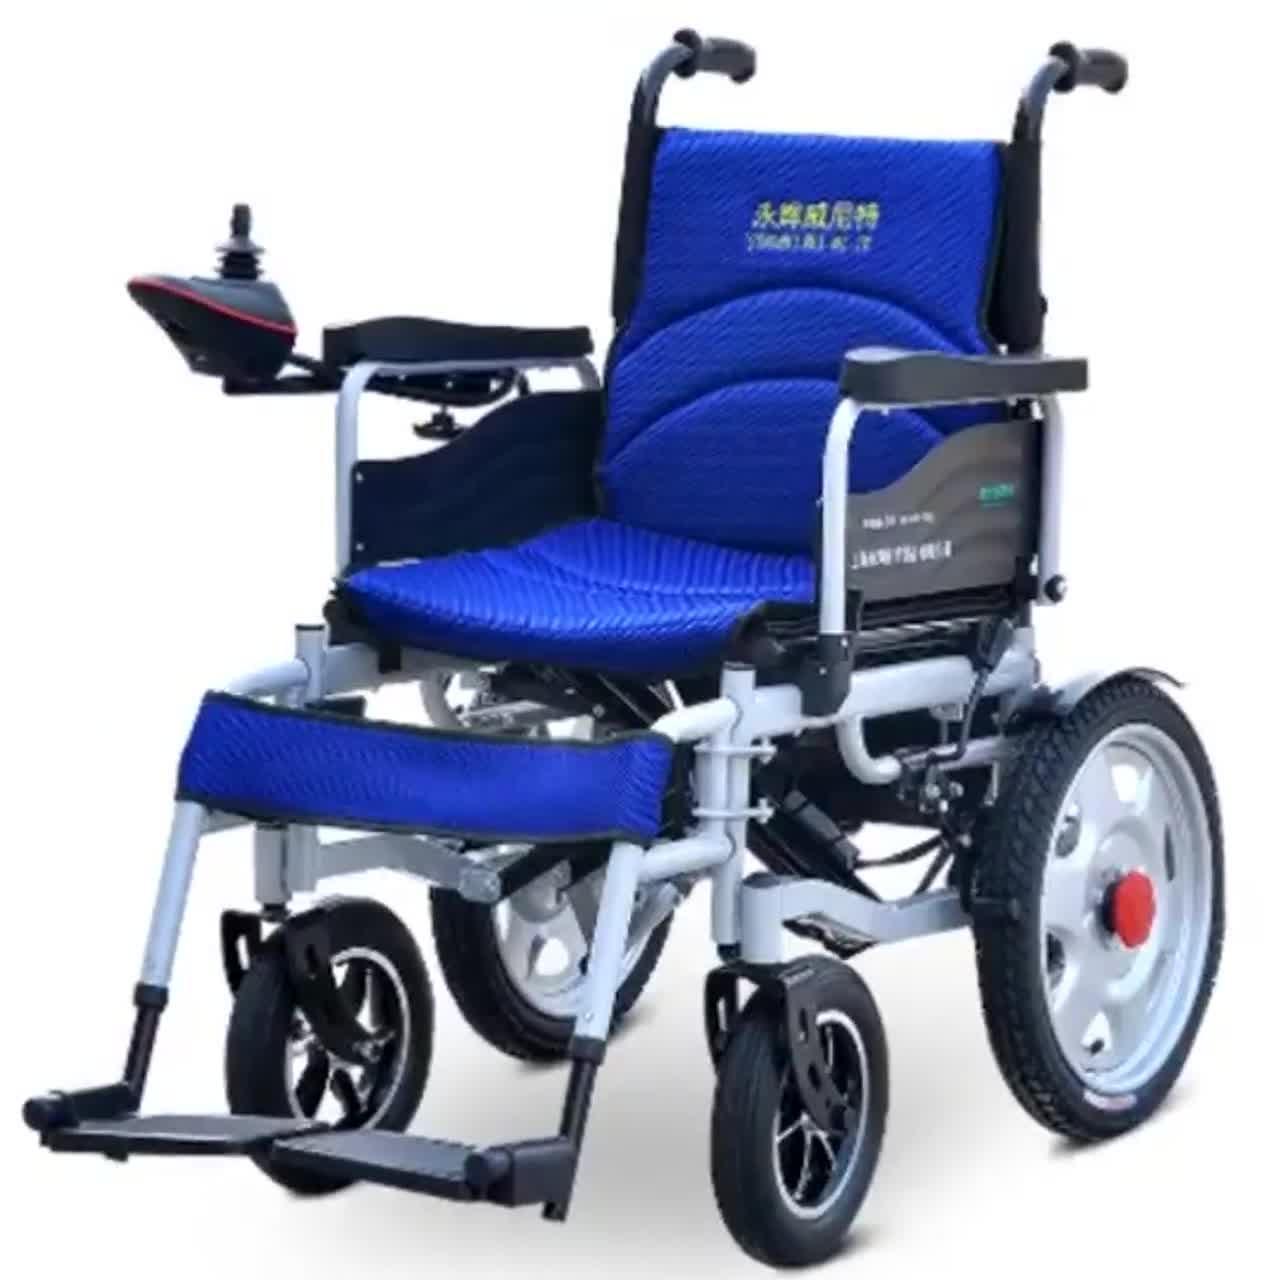 Luxury Portable Folding Power Wheelchair For Elderly